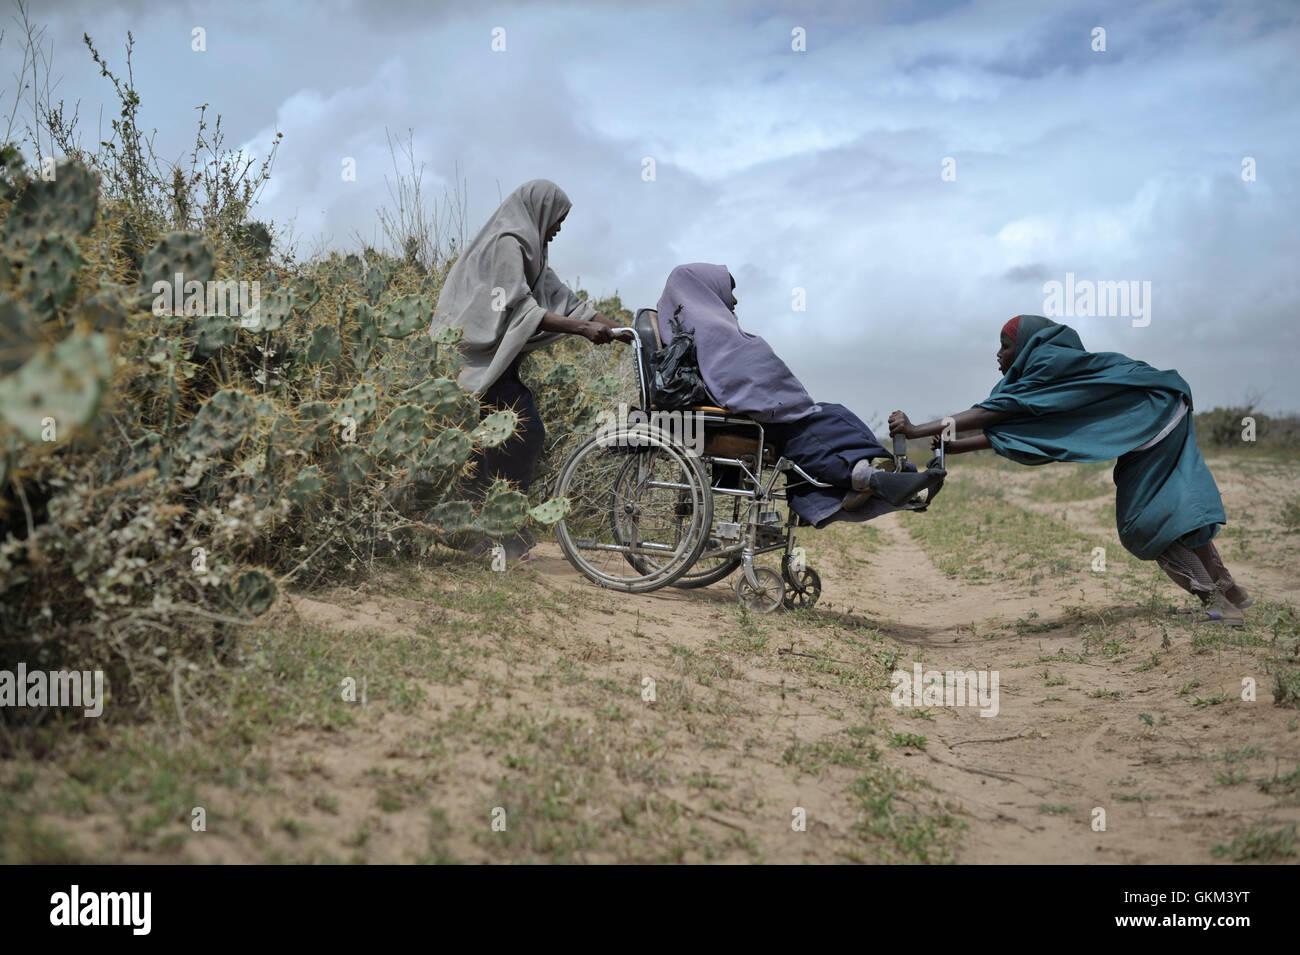 Dos mujeres ayudar a otro a través de un seto de cactii en un centro de distribución de alimentos en Afgoye, Imagen De Stock